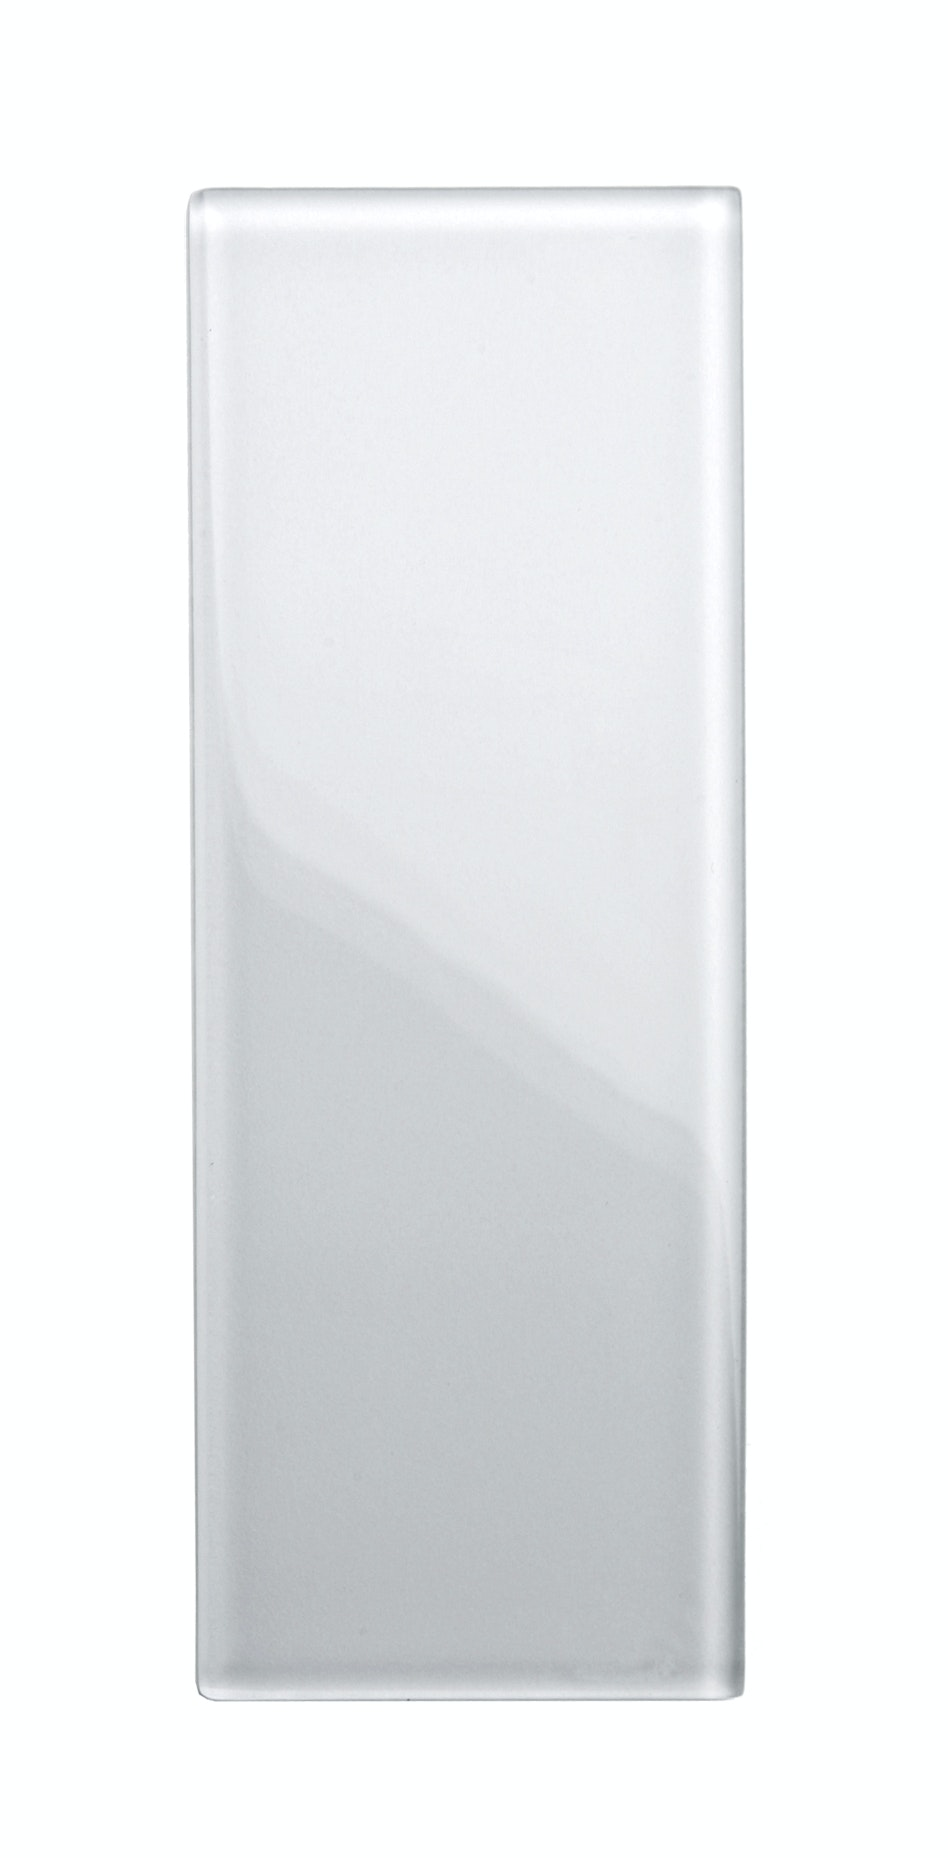 Avslutningsplatta Vetropro till glasbetong vit 4 st